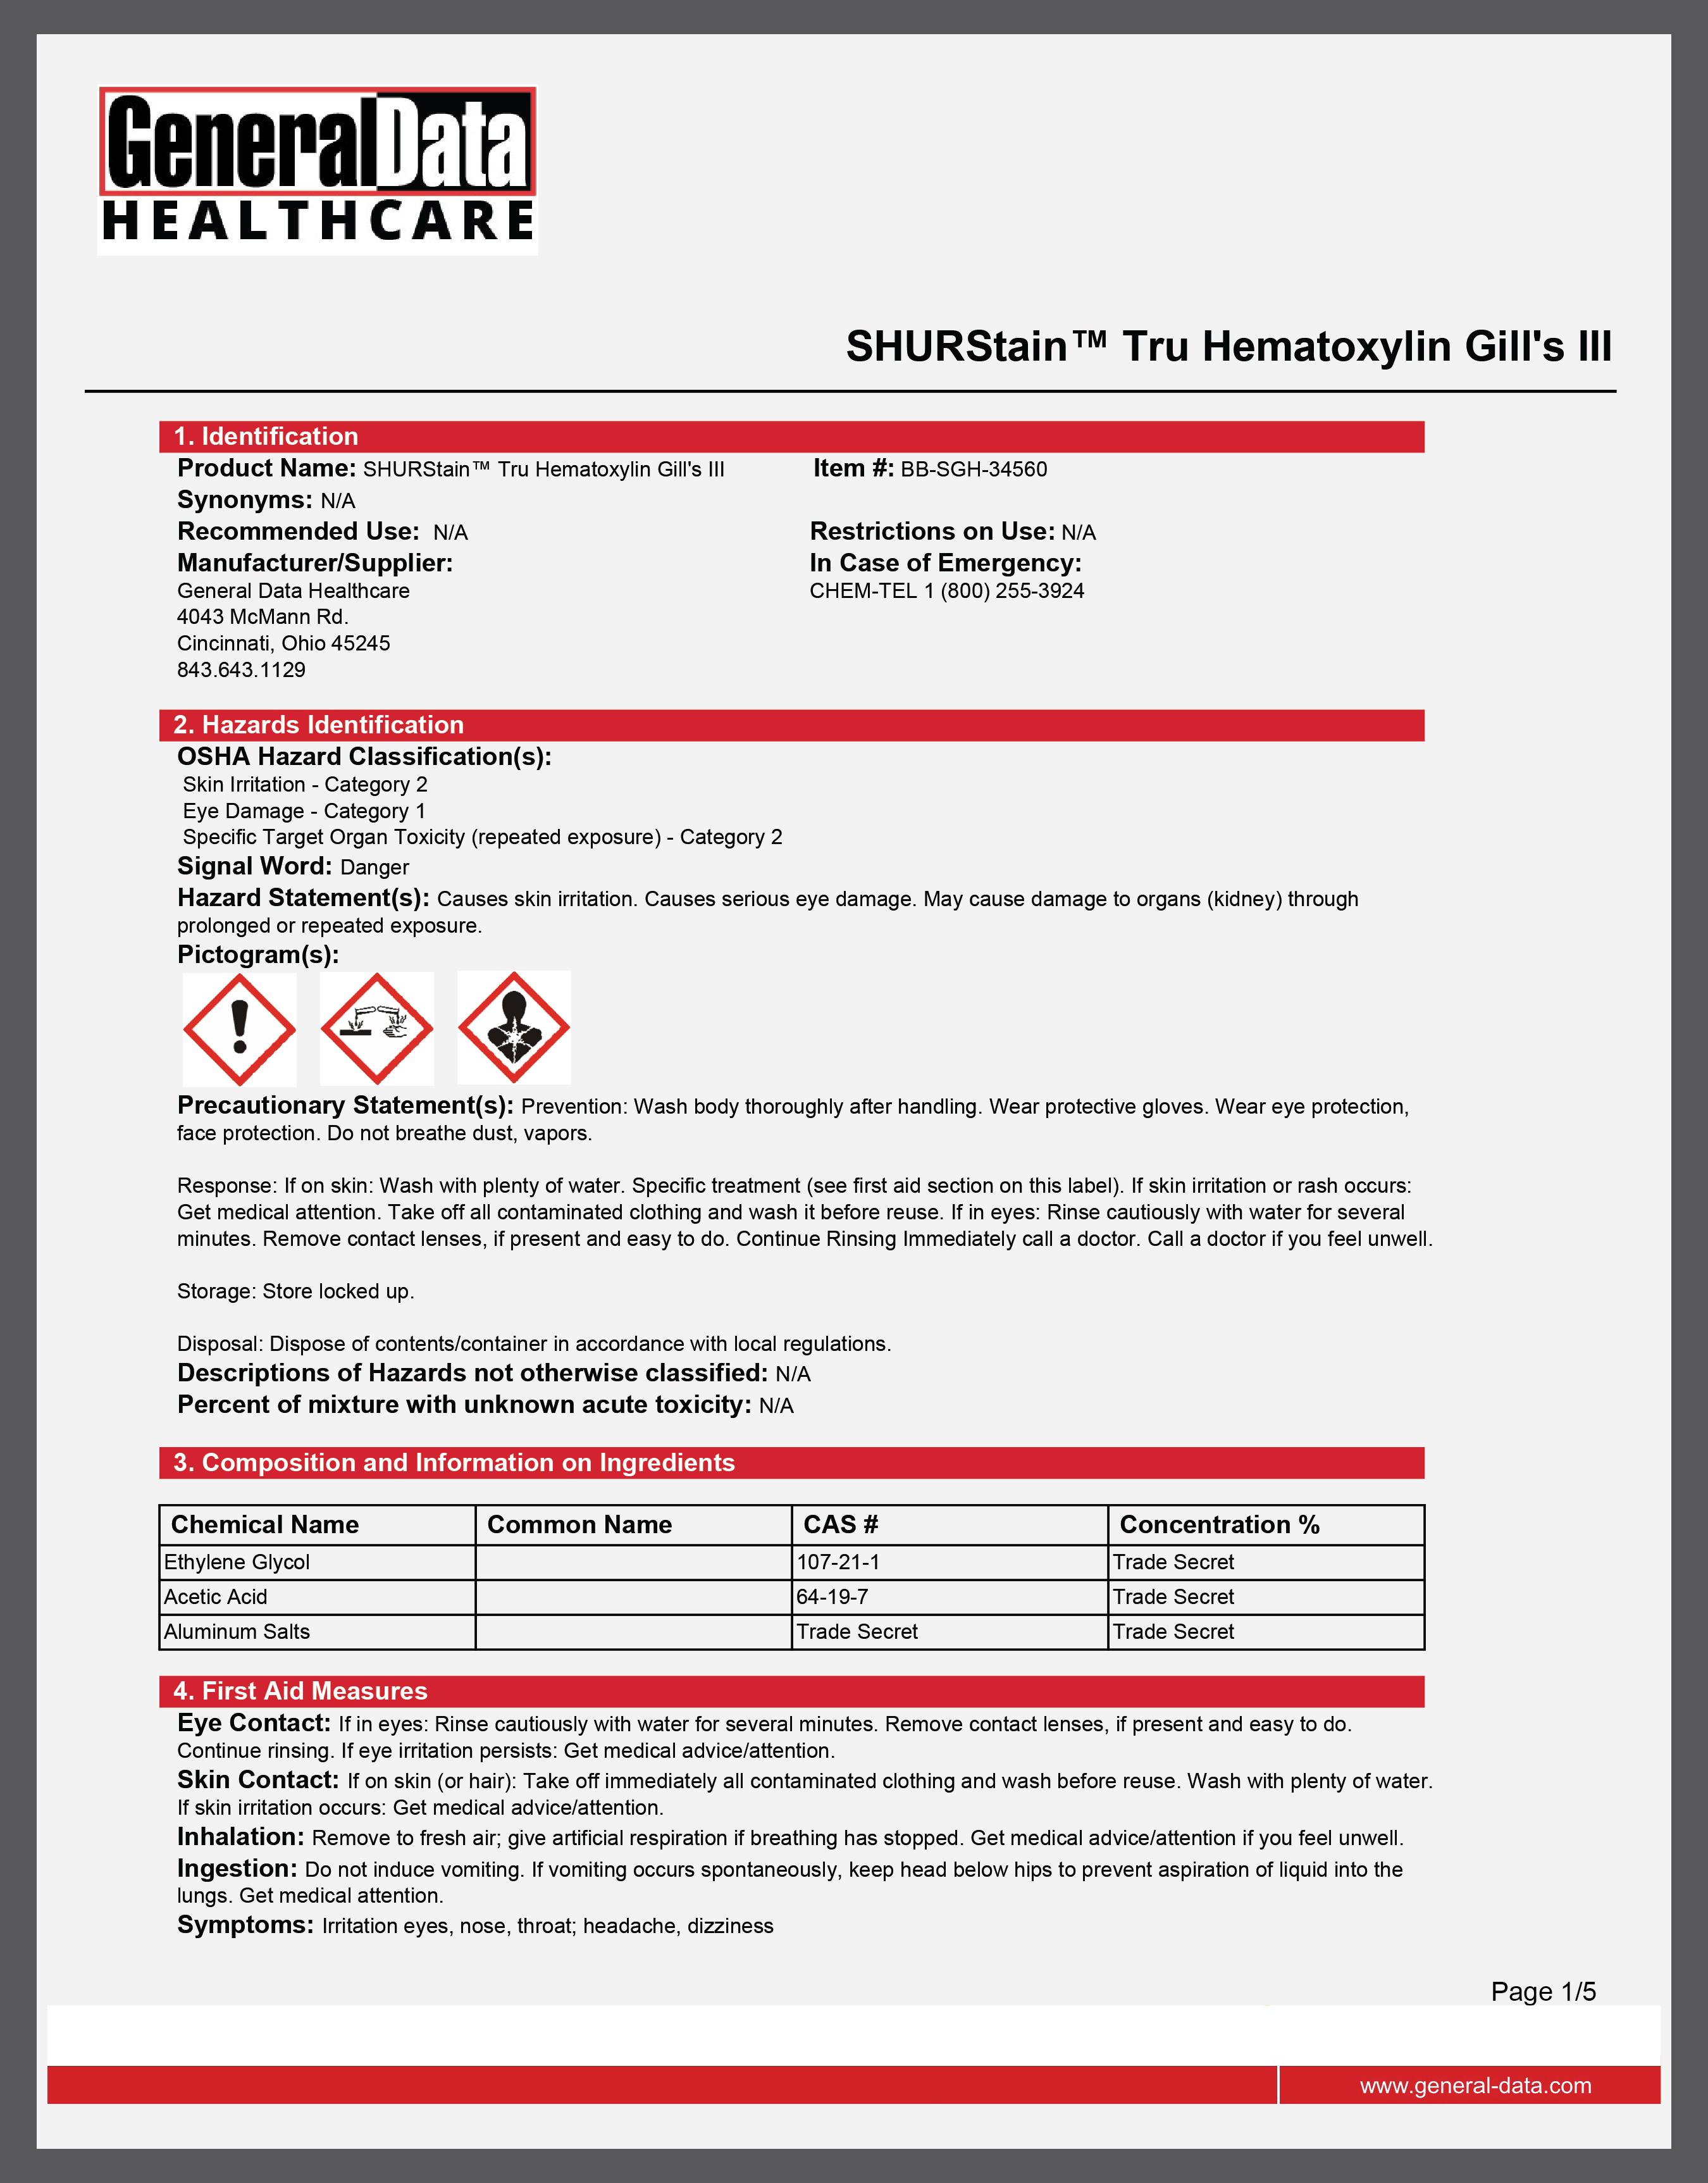 SHURStain Tru Hematoxylin Gill's III Safety Data Sheet